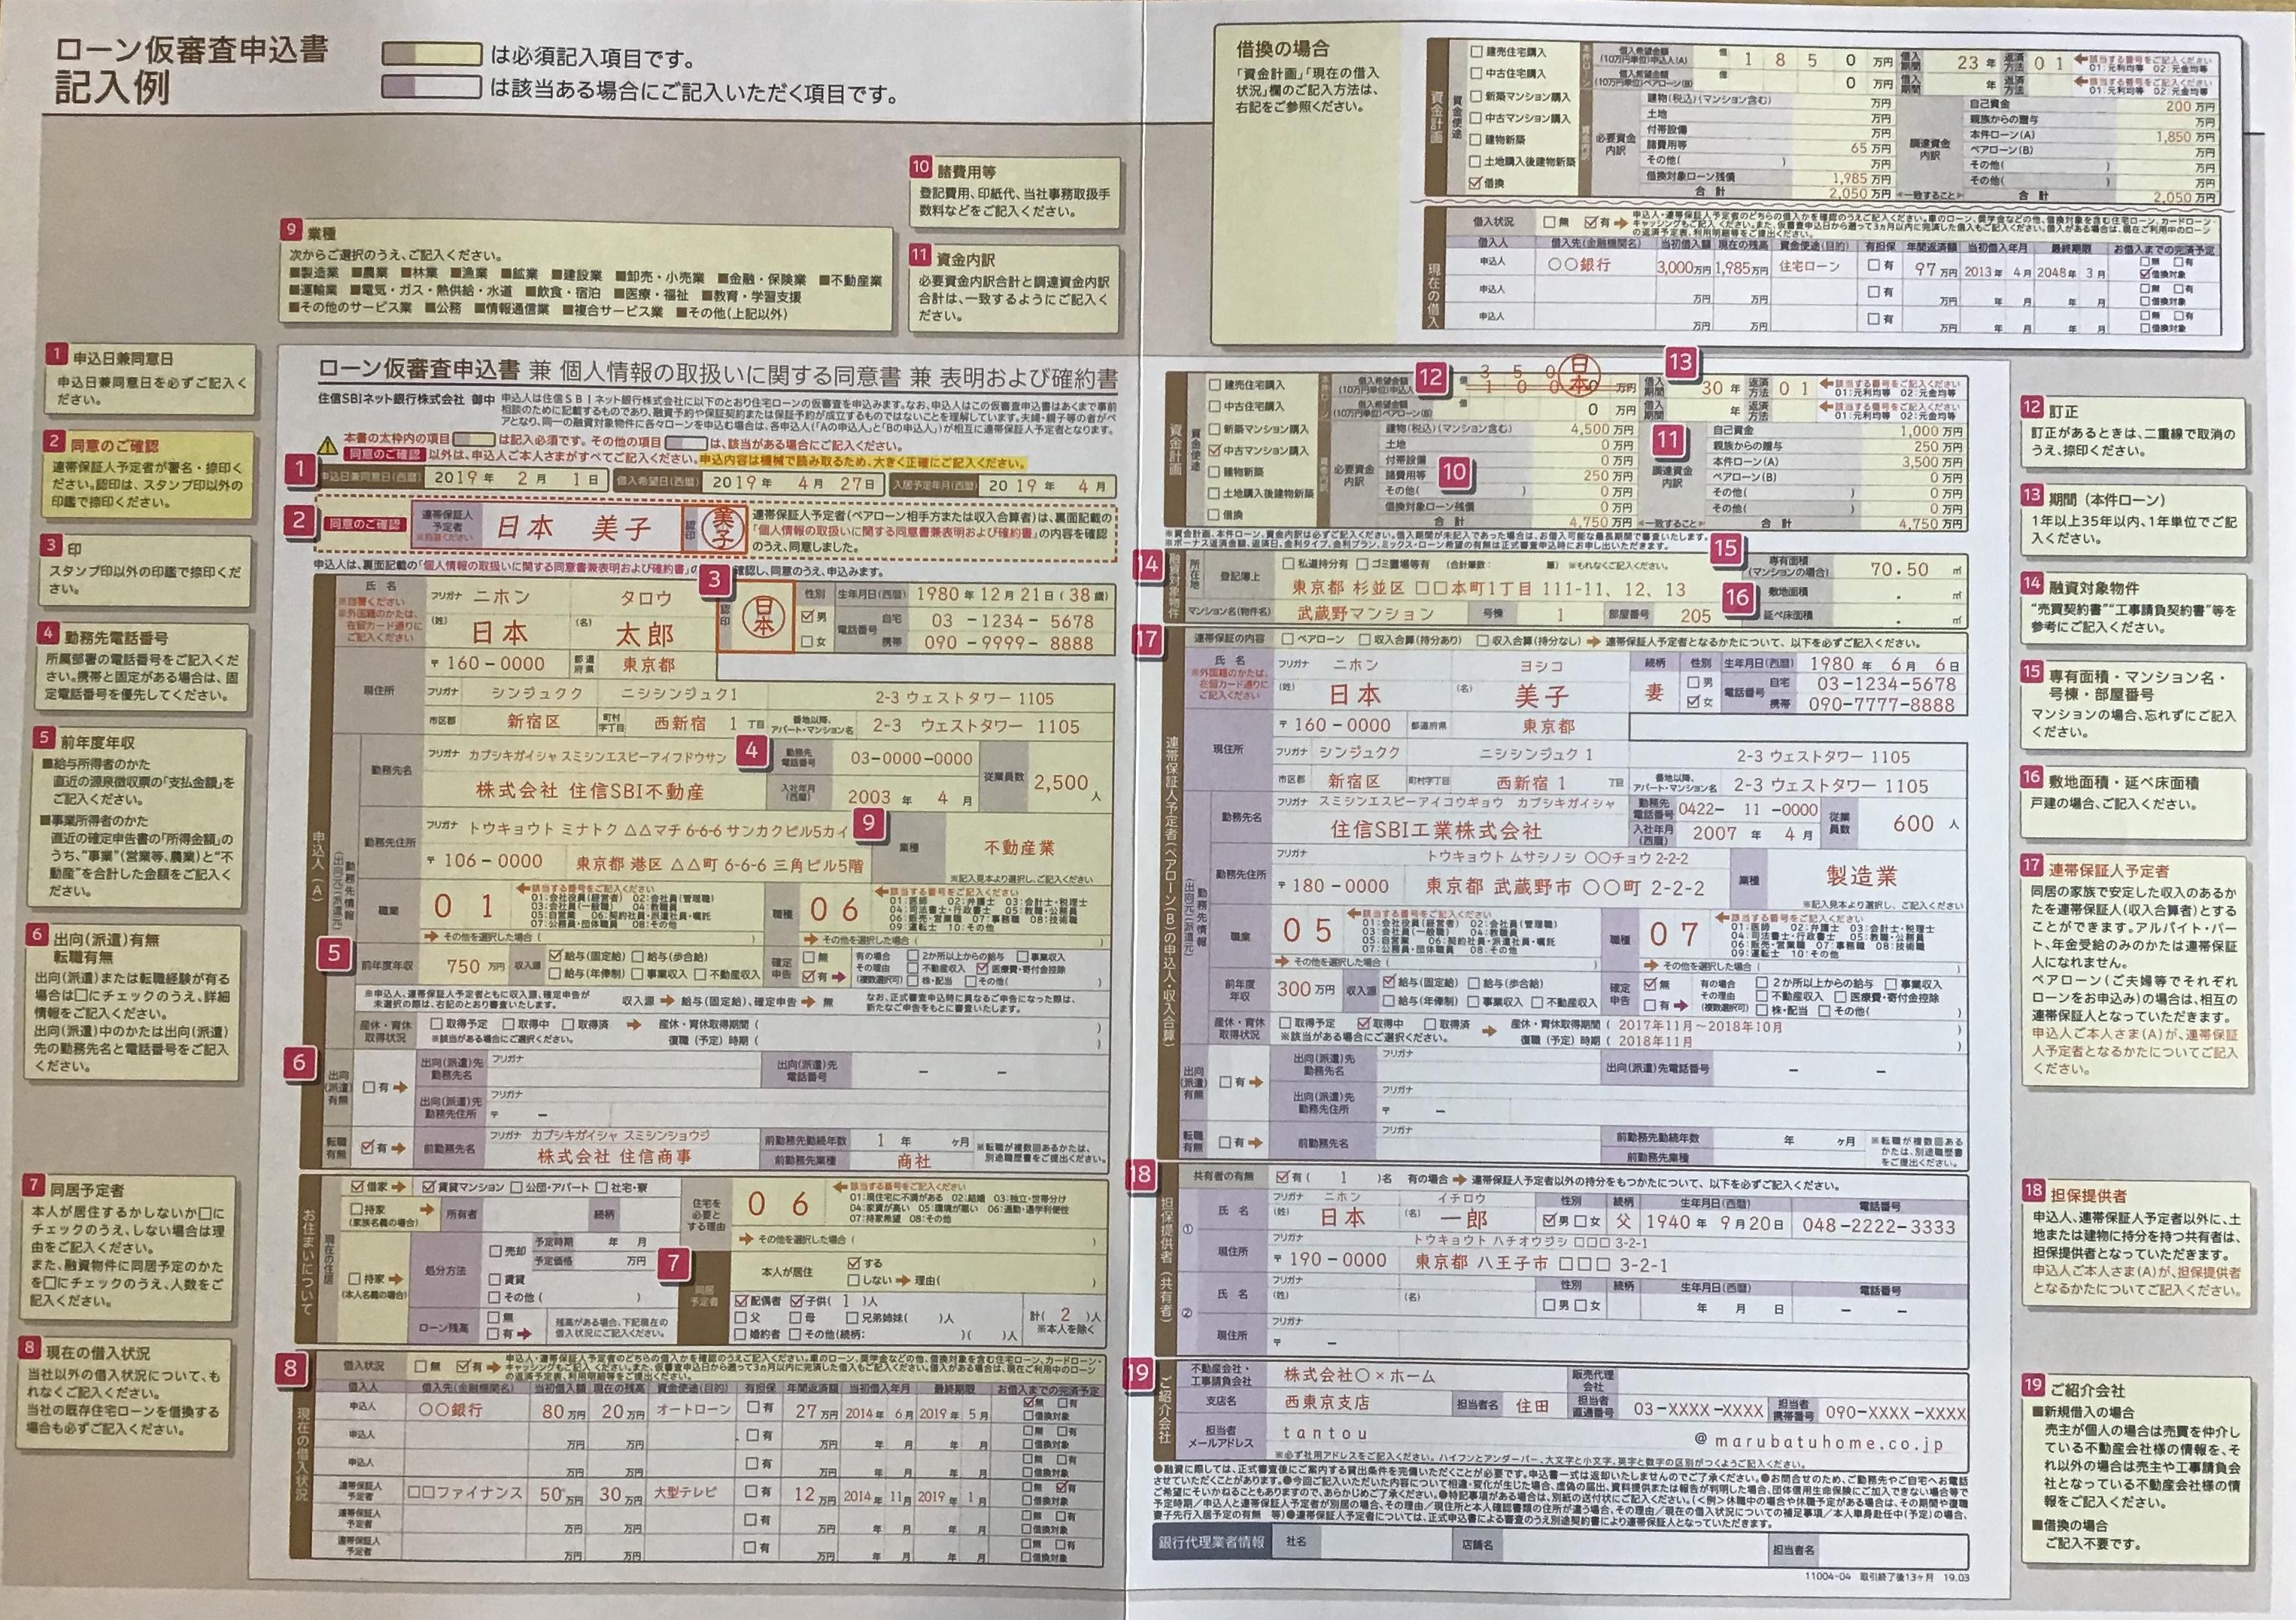 7CED6ABF-0ECF-45A6-8C57-B89D46532120